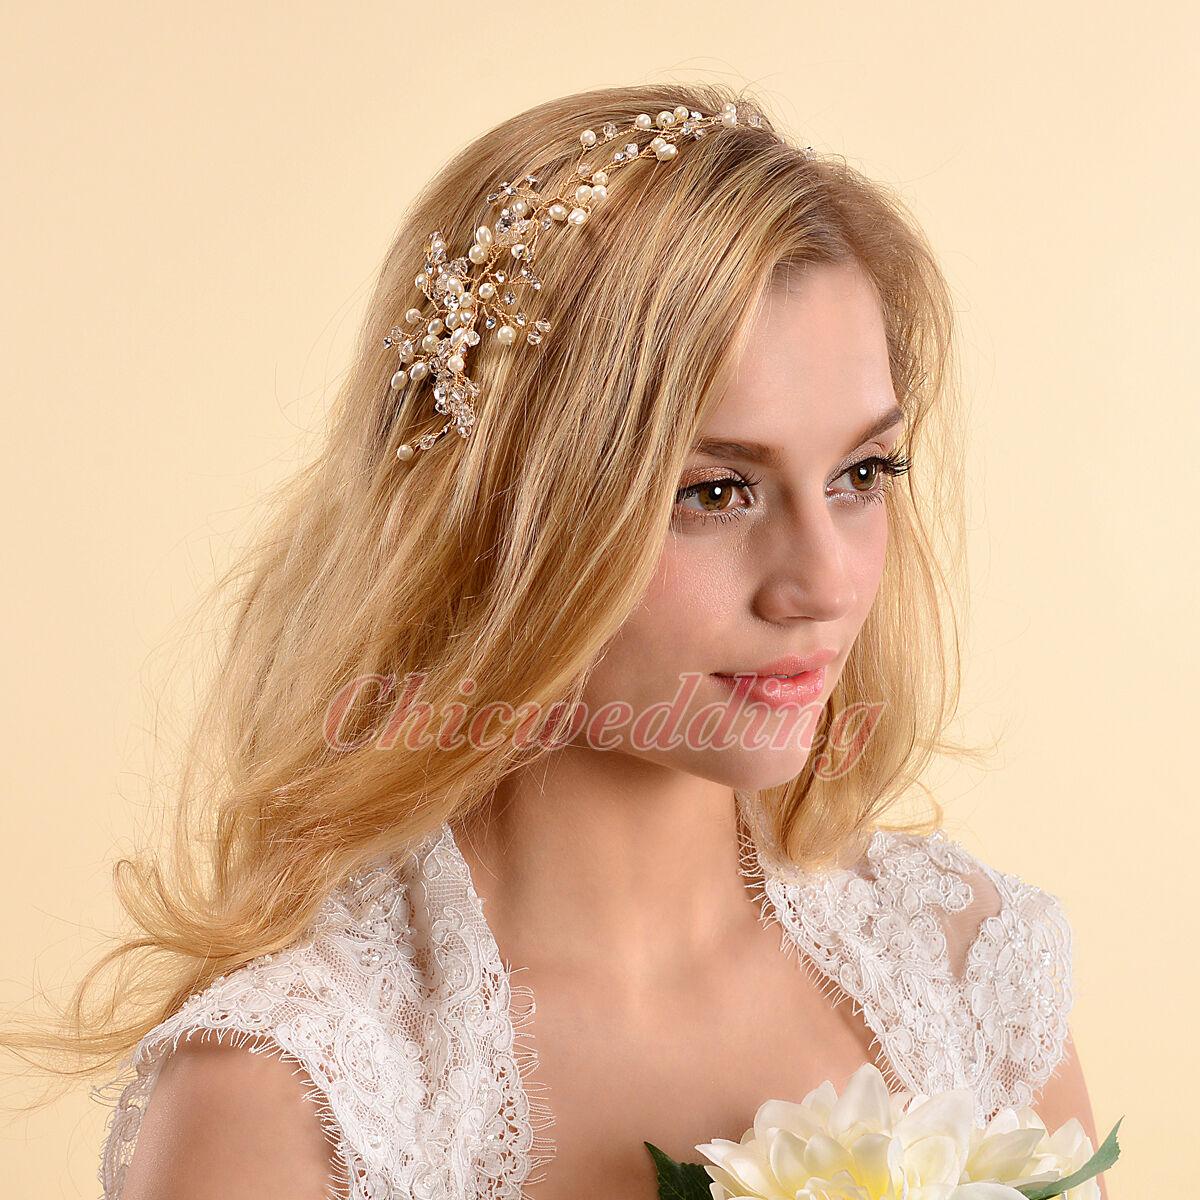 Luxury gold flower bridal tiara crown headband veil hair accessory picture 1 of 7 izmirmasajfo